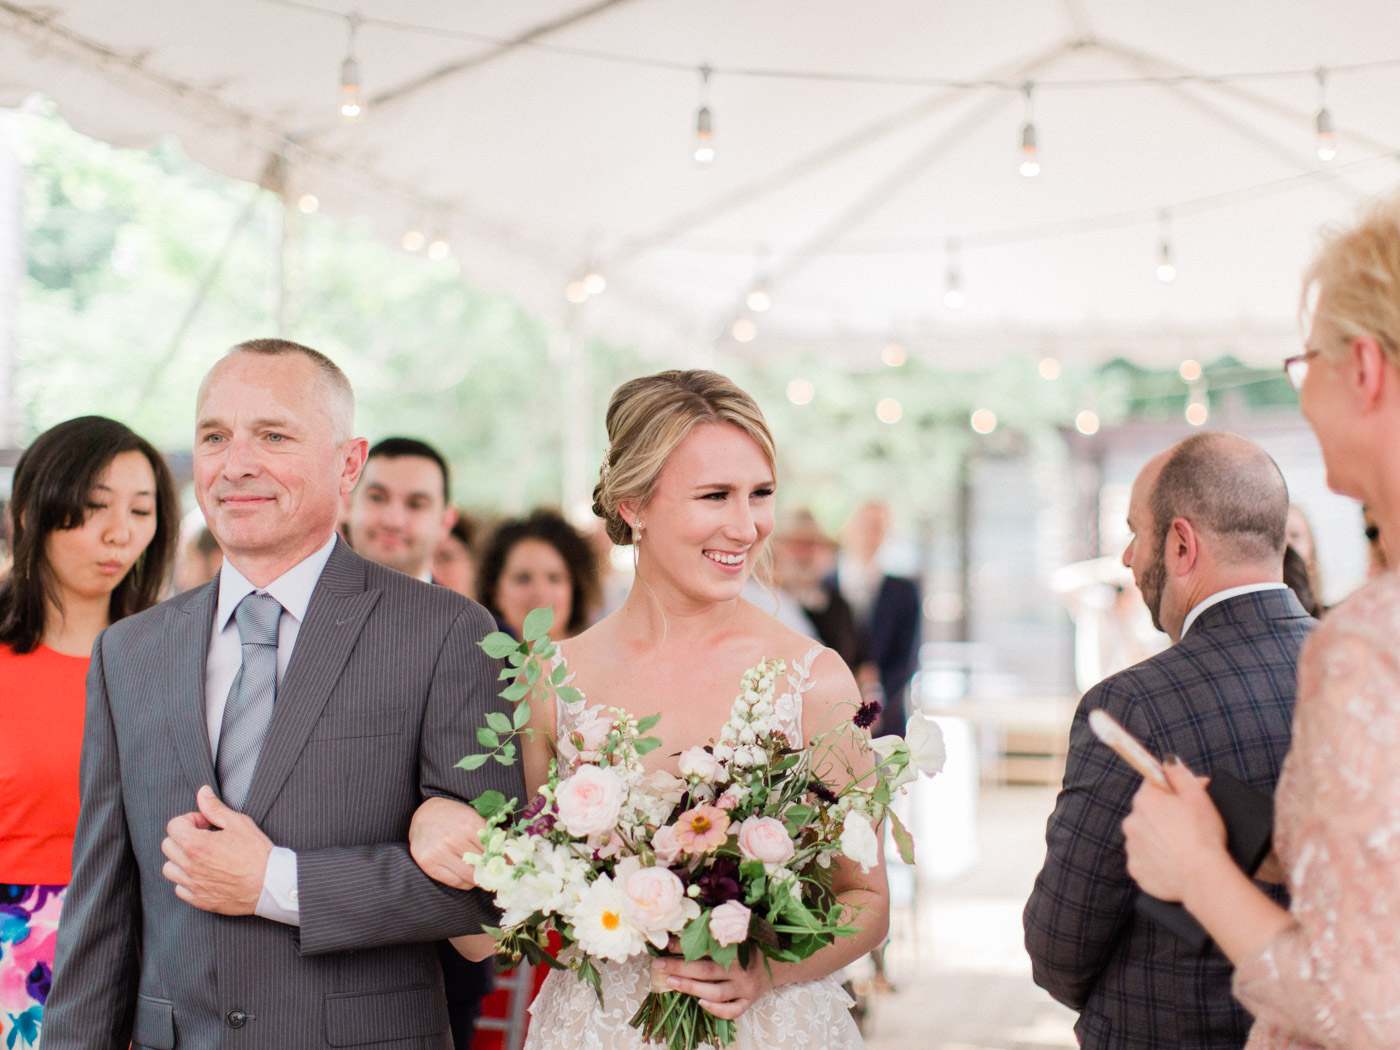 downtown-toronto-wedding-photographer-berkley-fieldhouse-blush-274.jpg